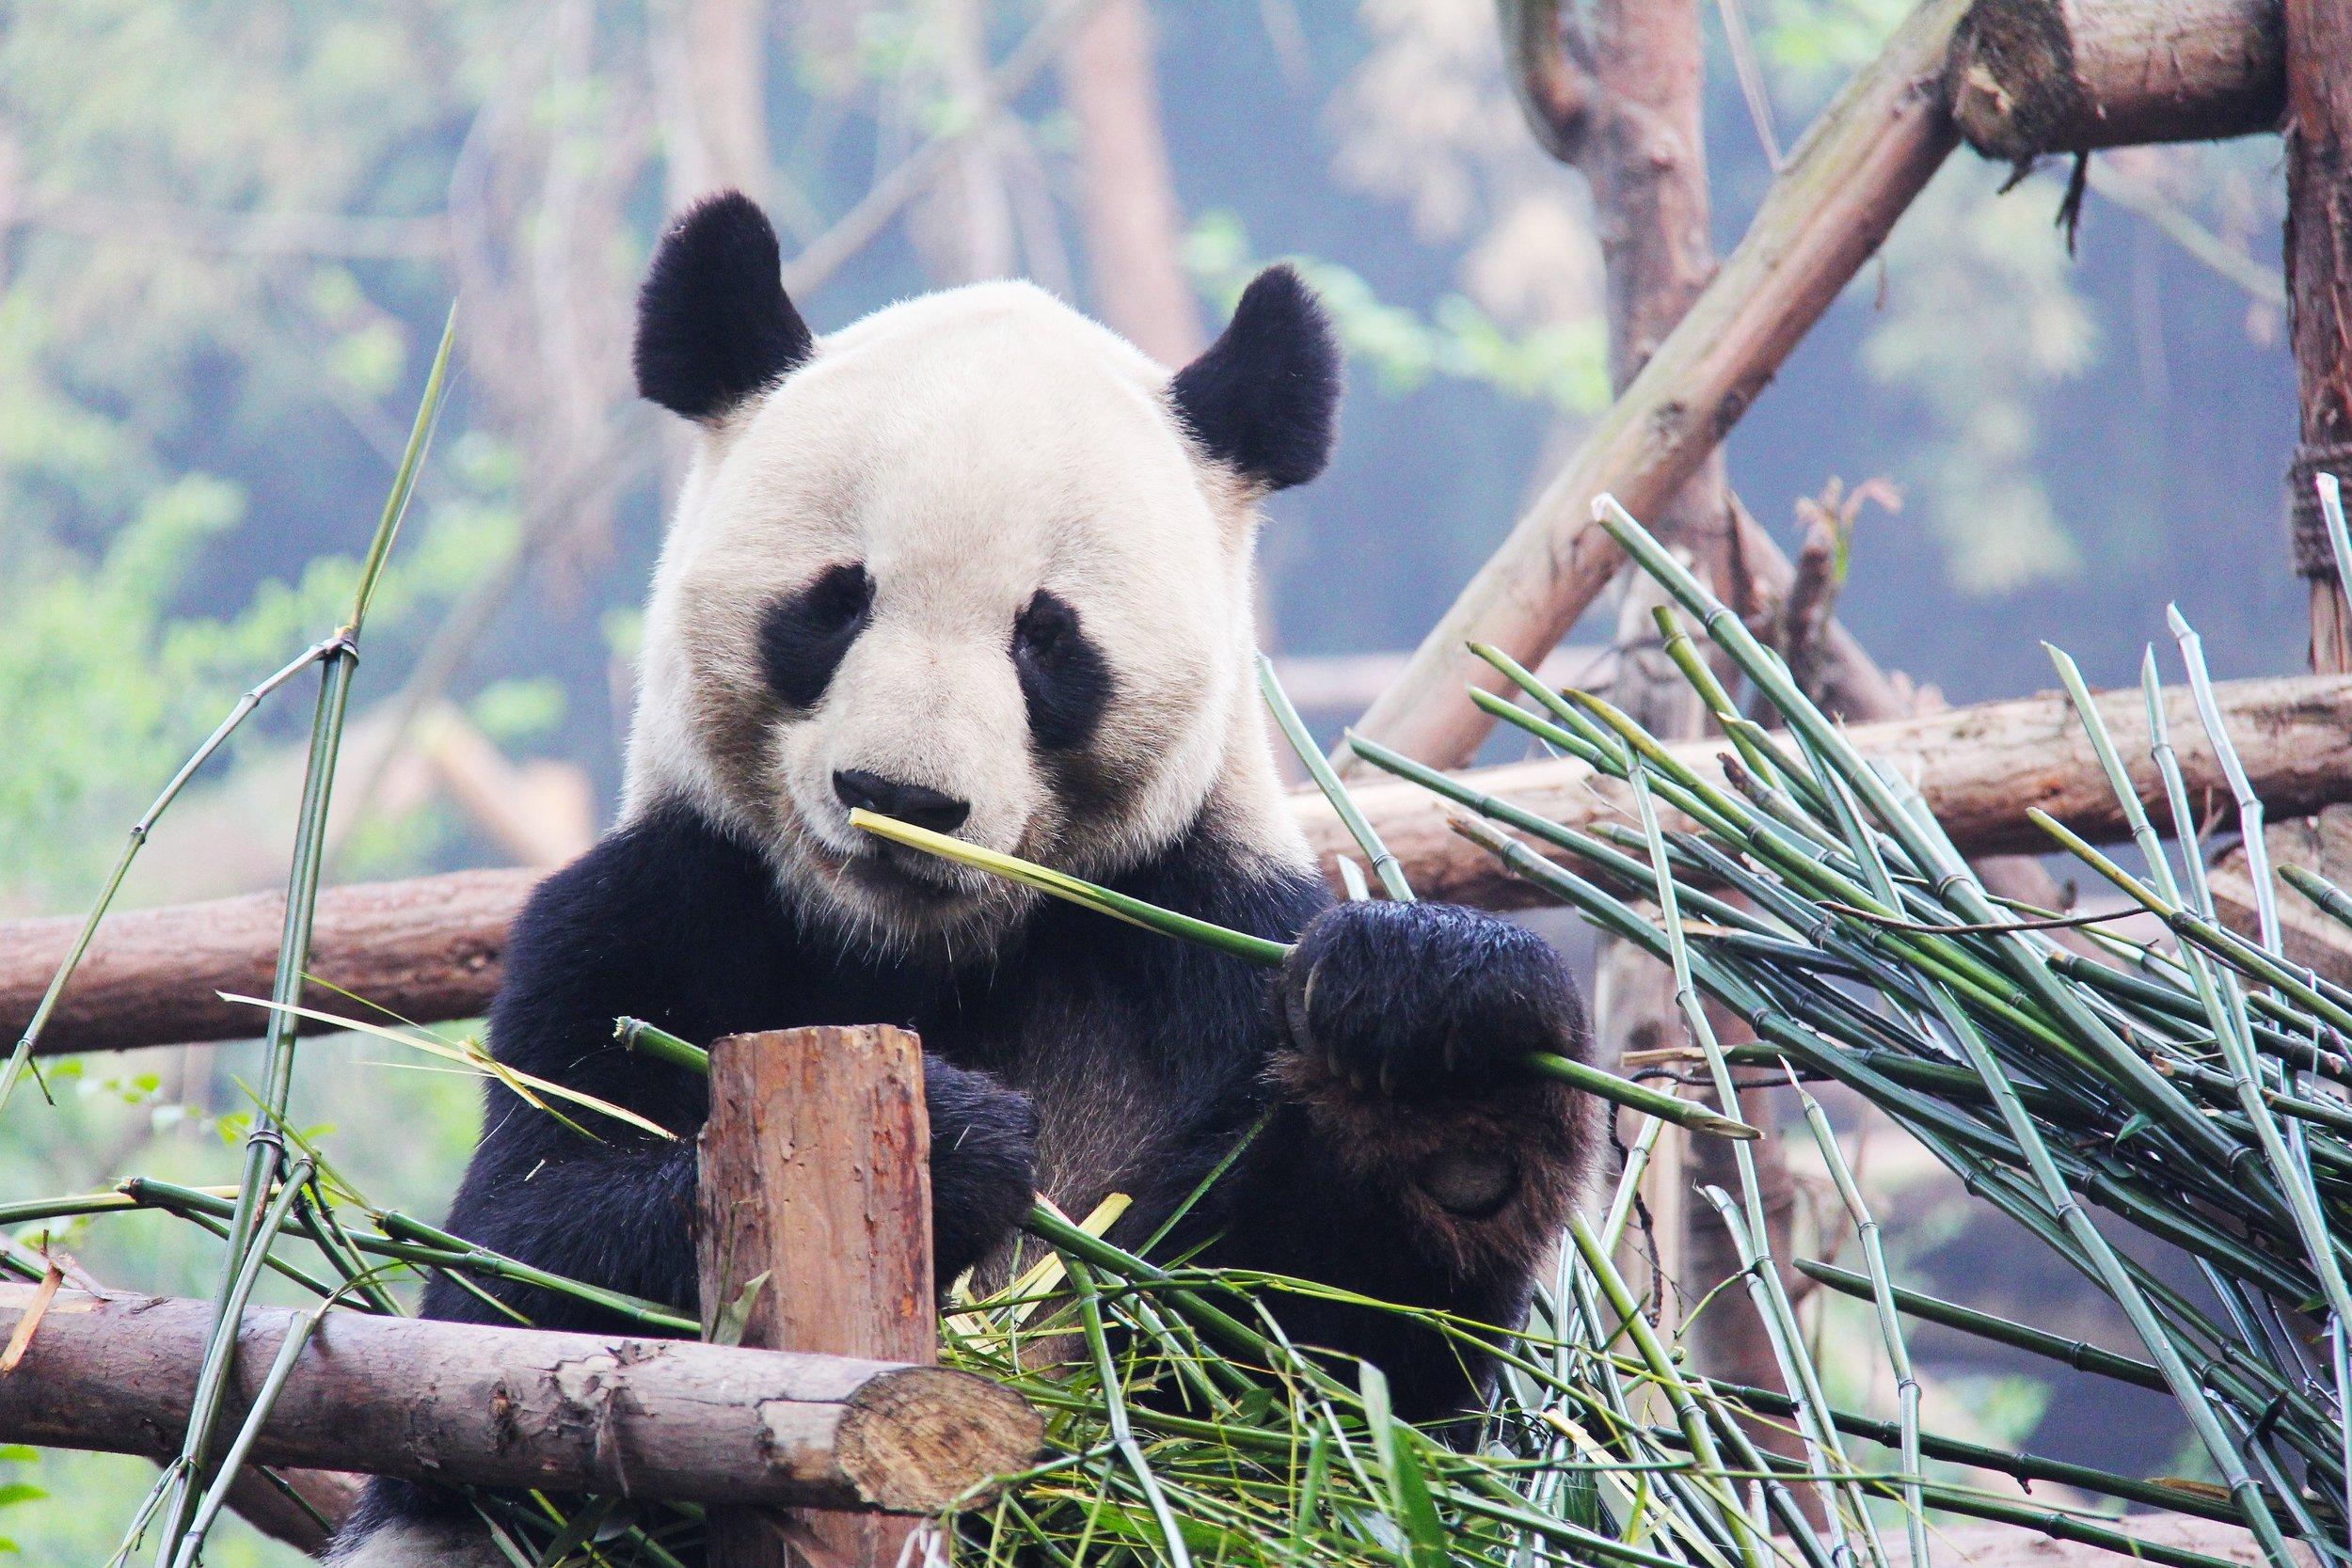 Bamboo is the panda's main source of nourishment.